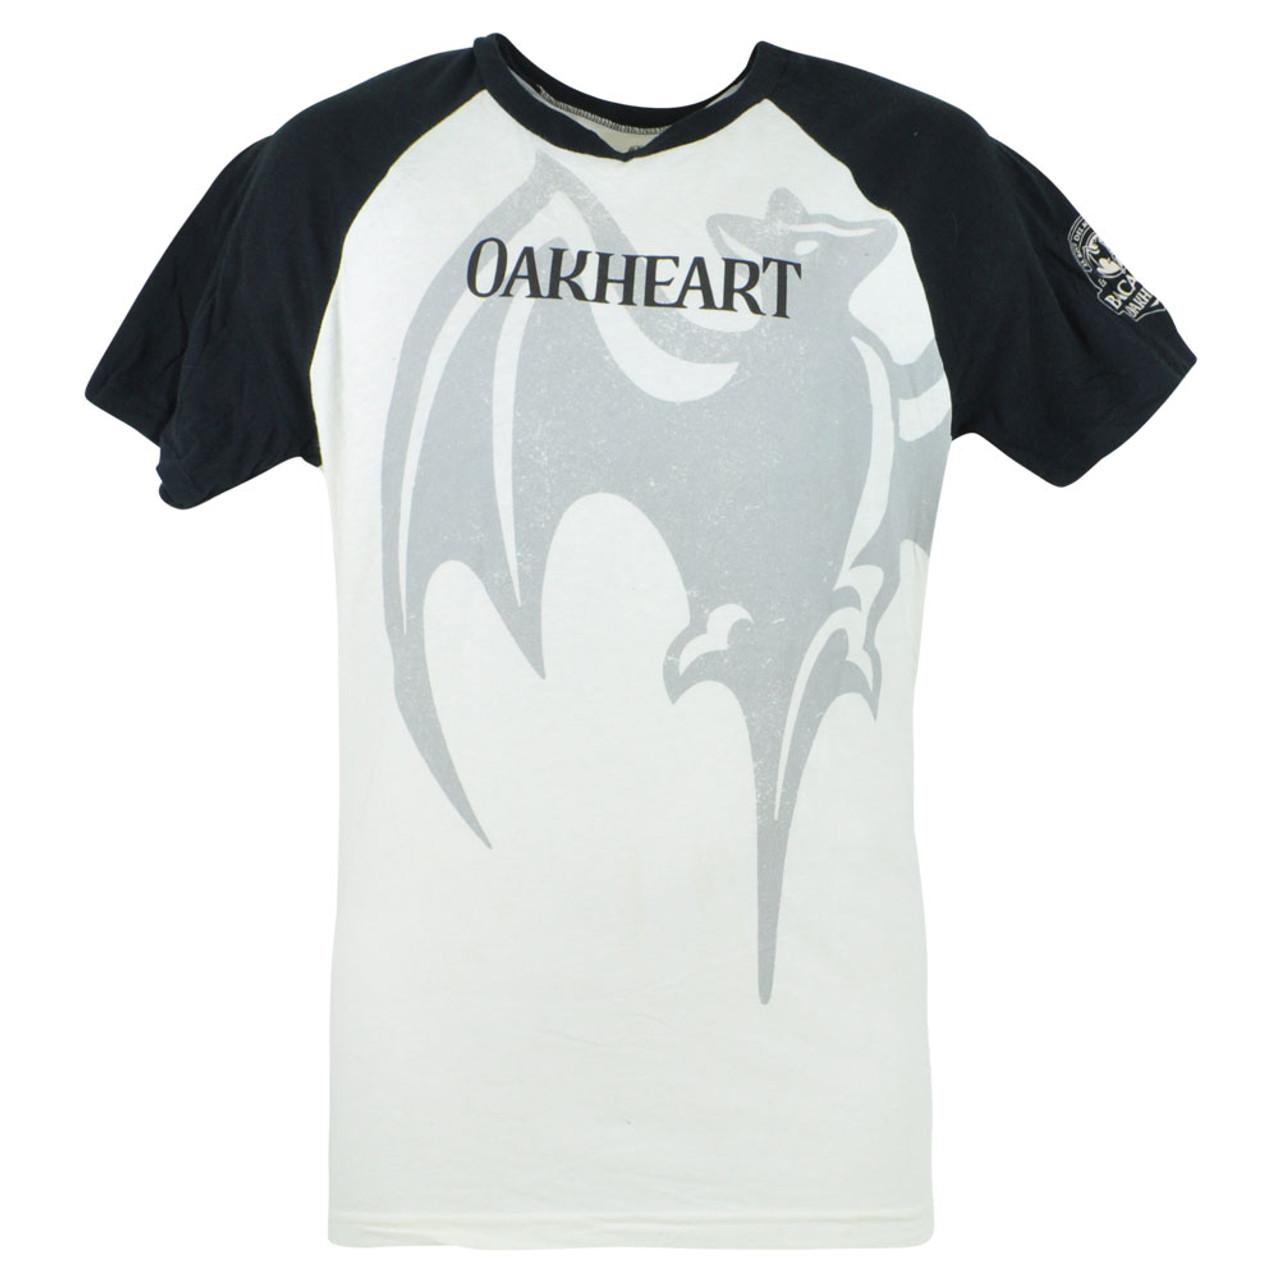 64120b22ead Bacardi Oakheart Original Premium Rum Tee Distress Bat Logo T-Shirt Medium  Beige - Cap Store Online.com